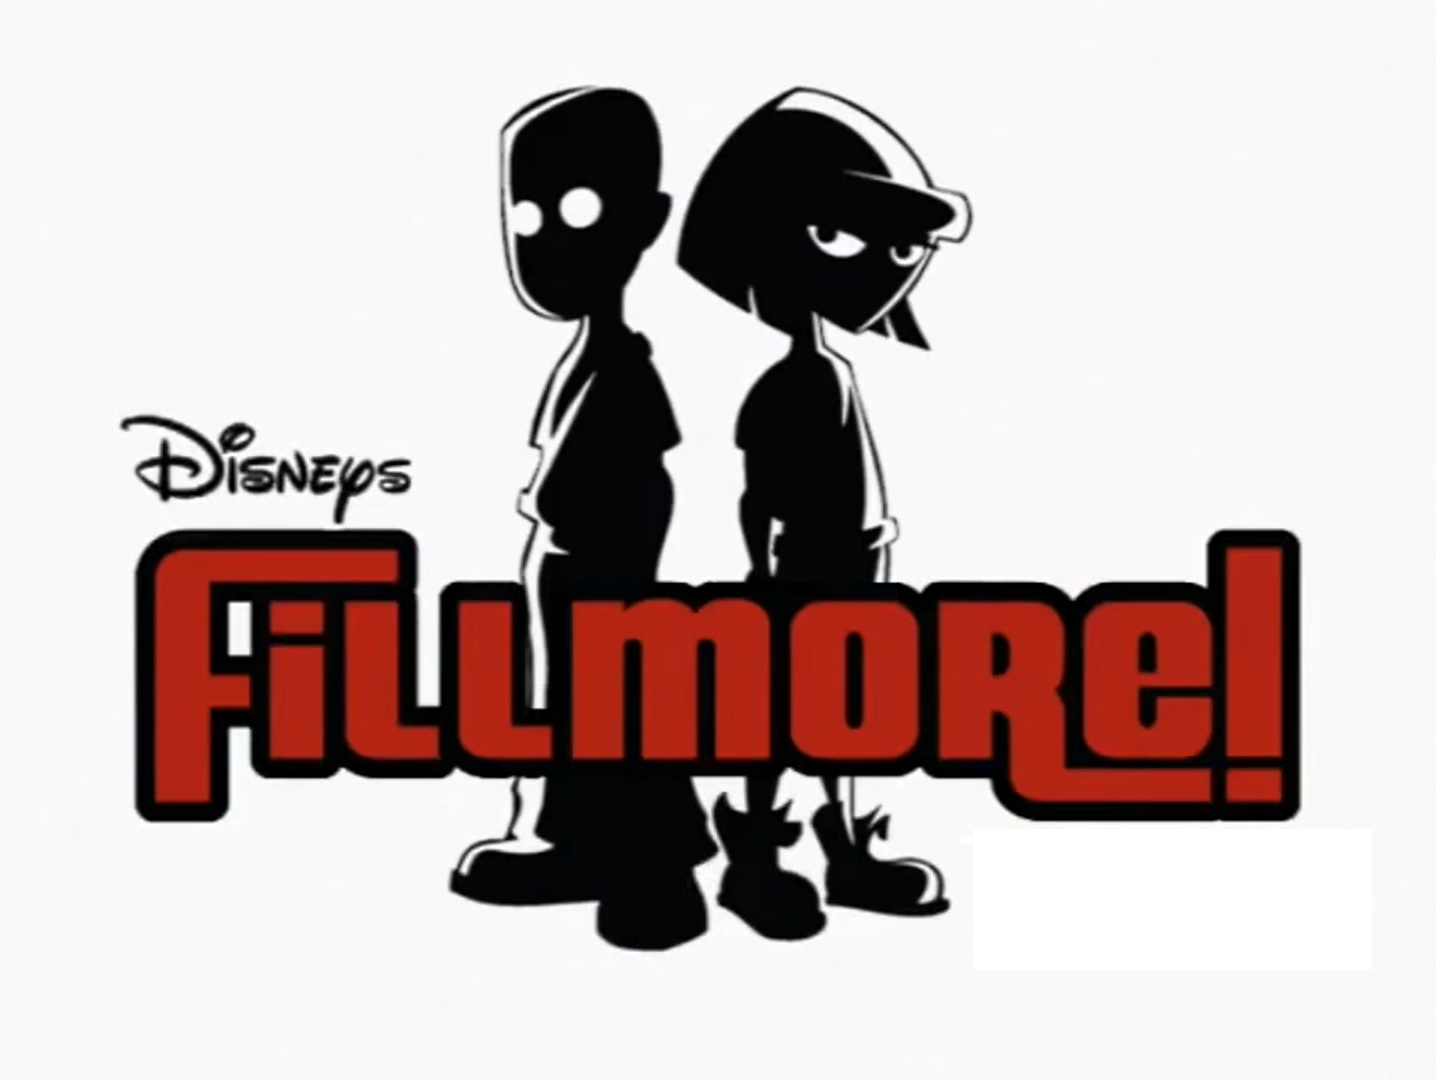 Disneys Filmore